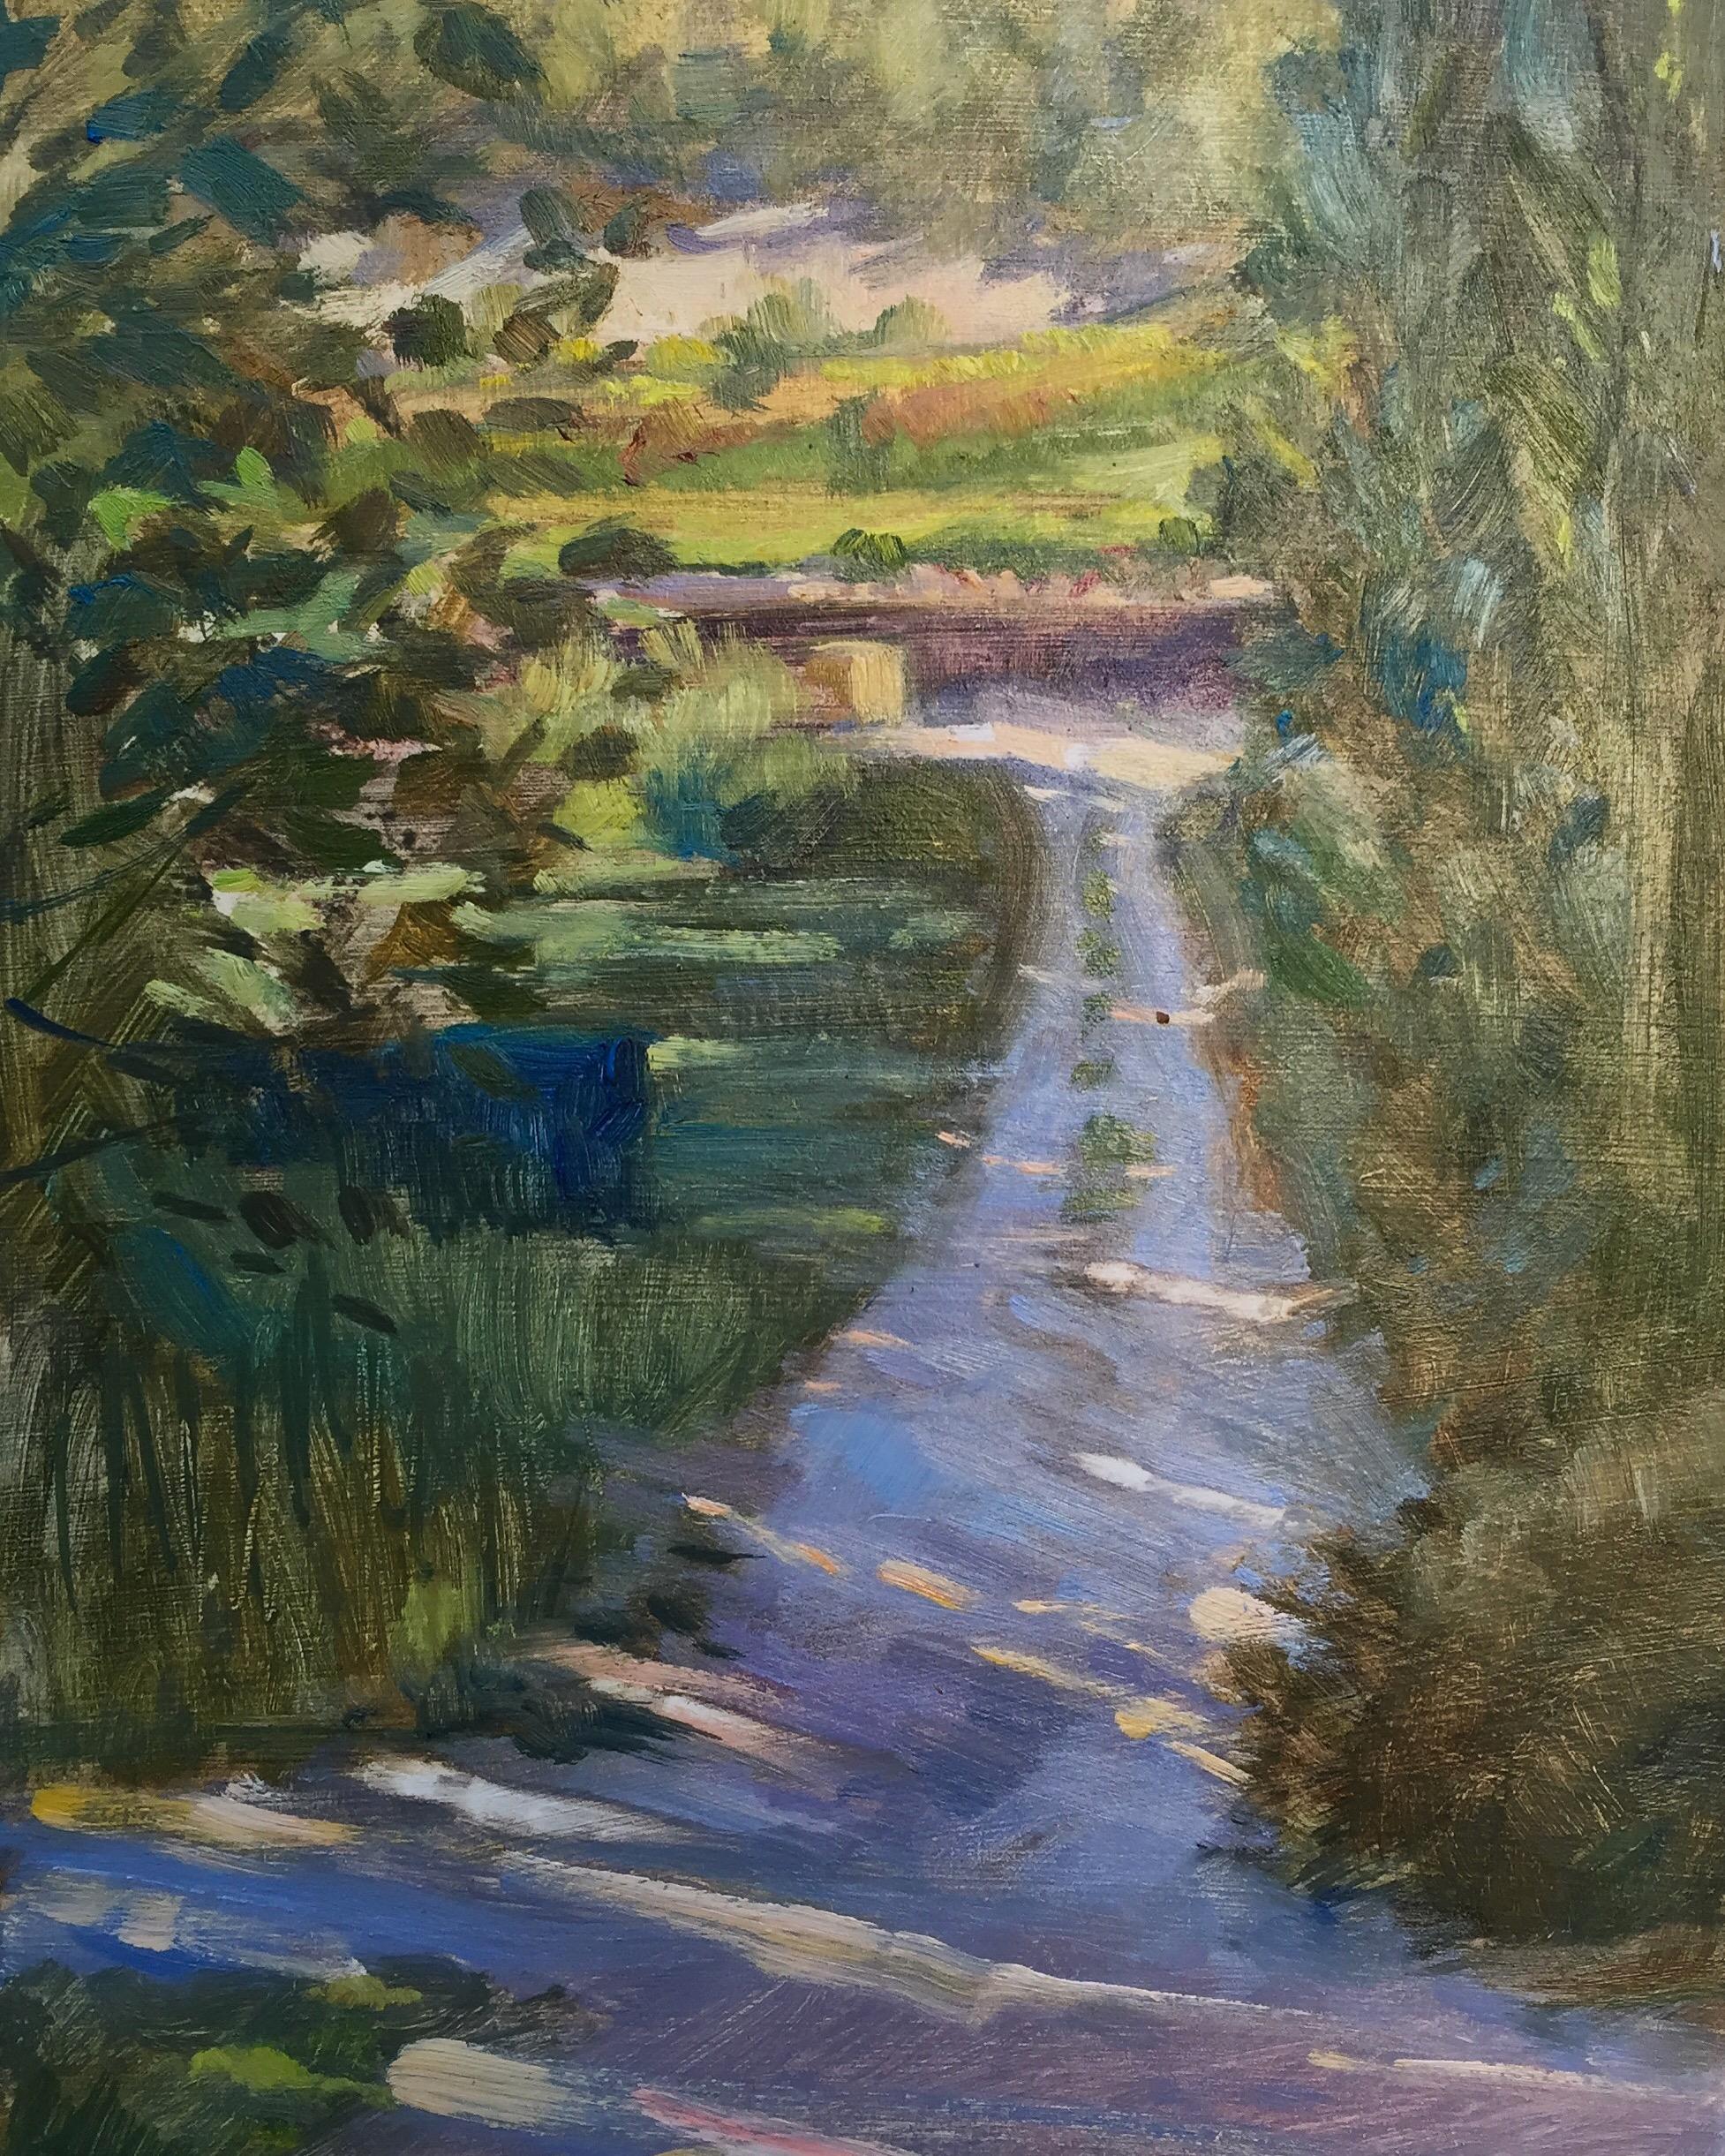 The Road to La Madelene